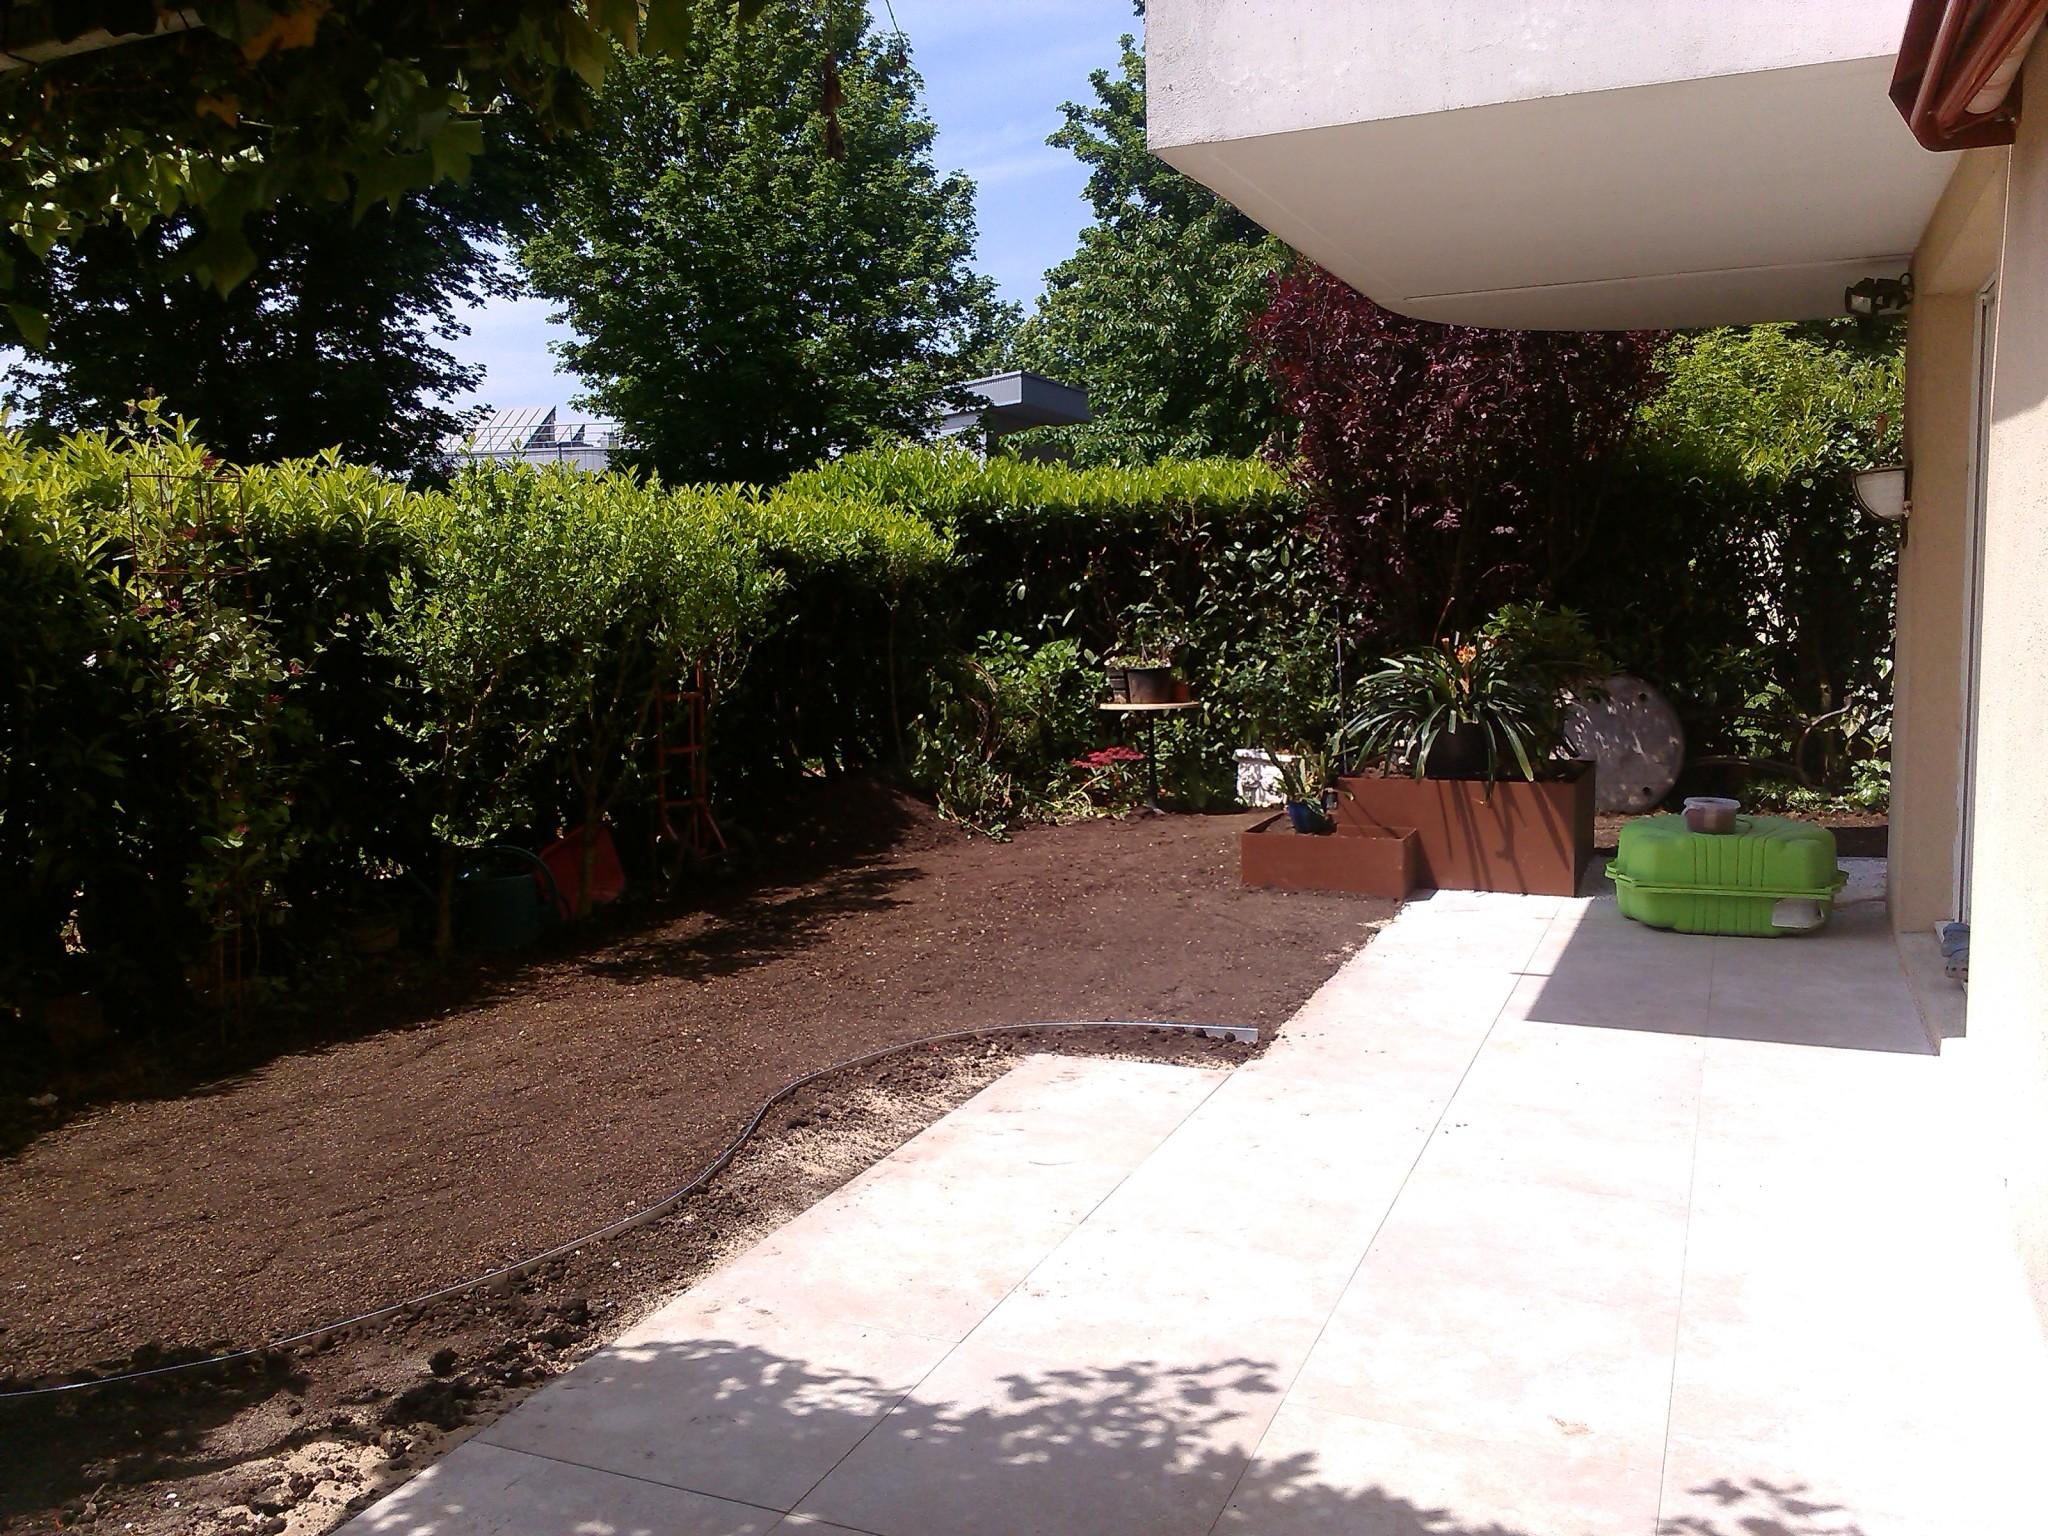 106 amenagement jardin dijon c 39 deco paysagiste dijon entretien espaces verts amnagement. Black Bedroom Furniture Sets. Home Design Ideas